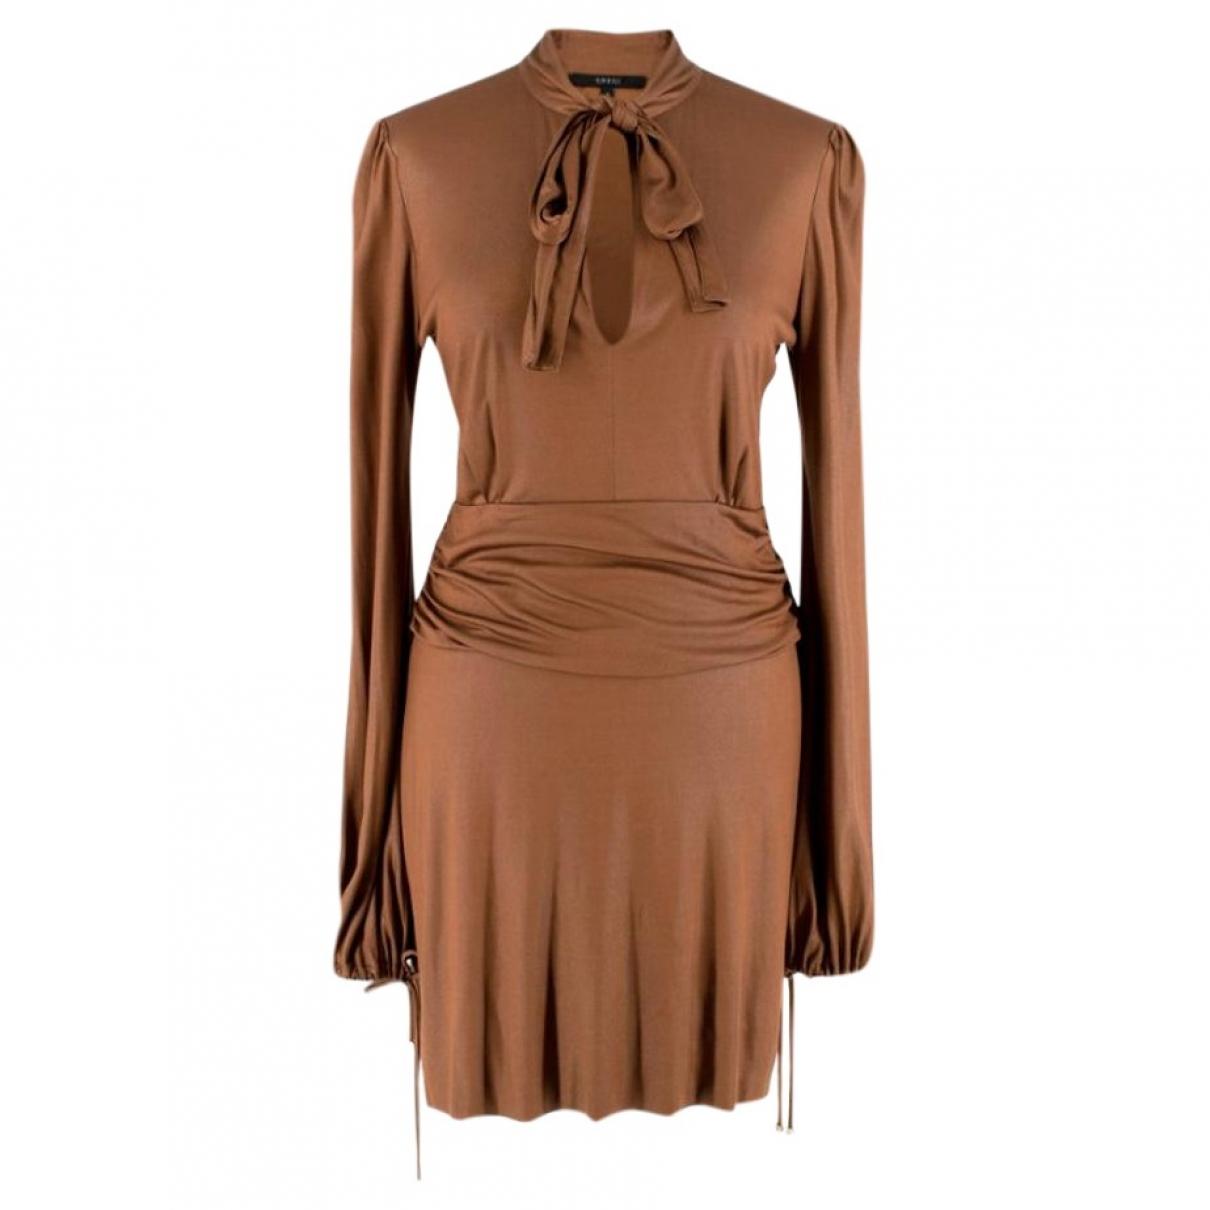 Gucci \N Brown dress for Women S International